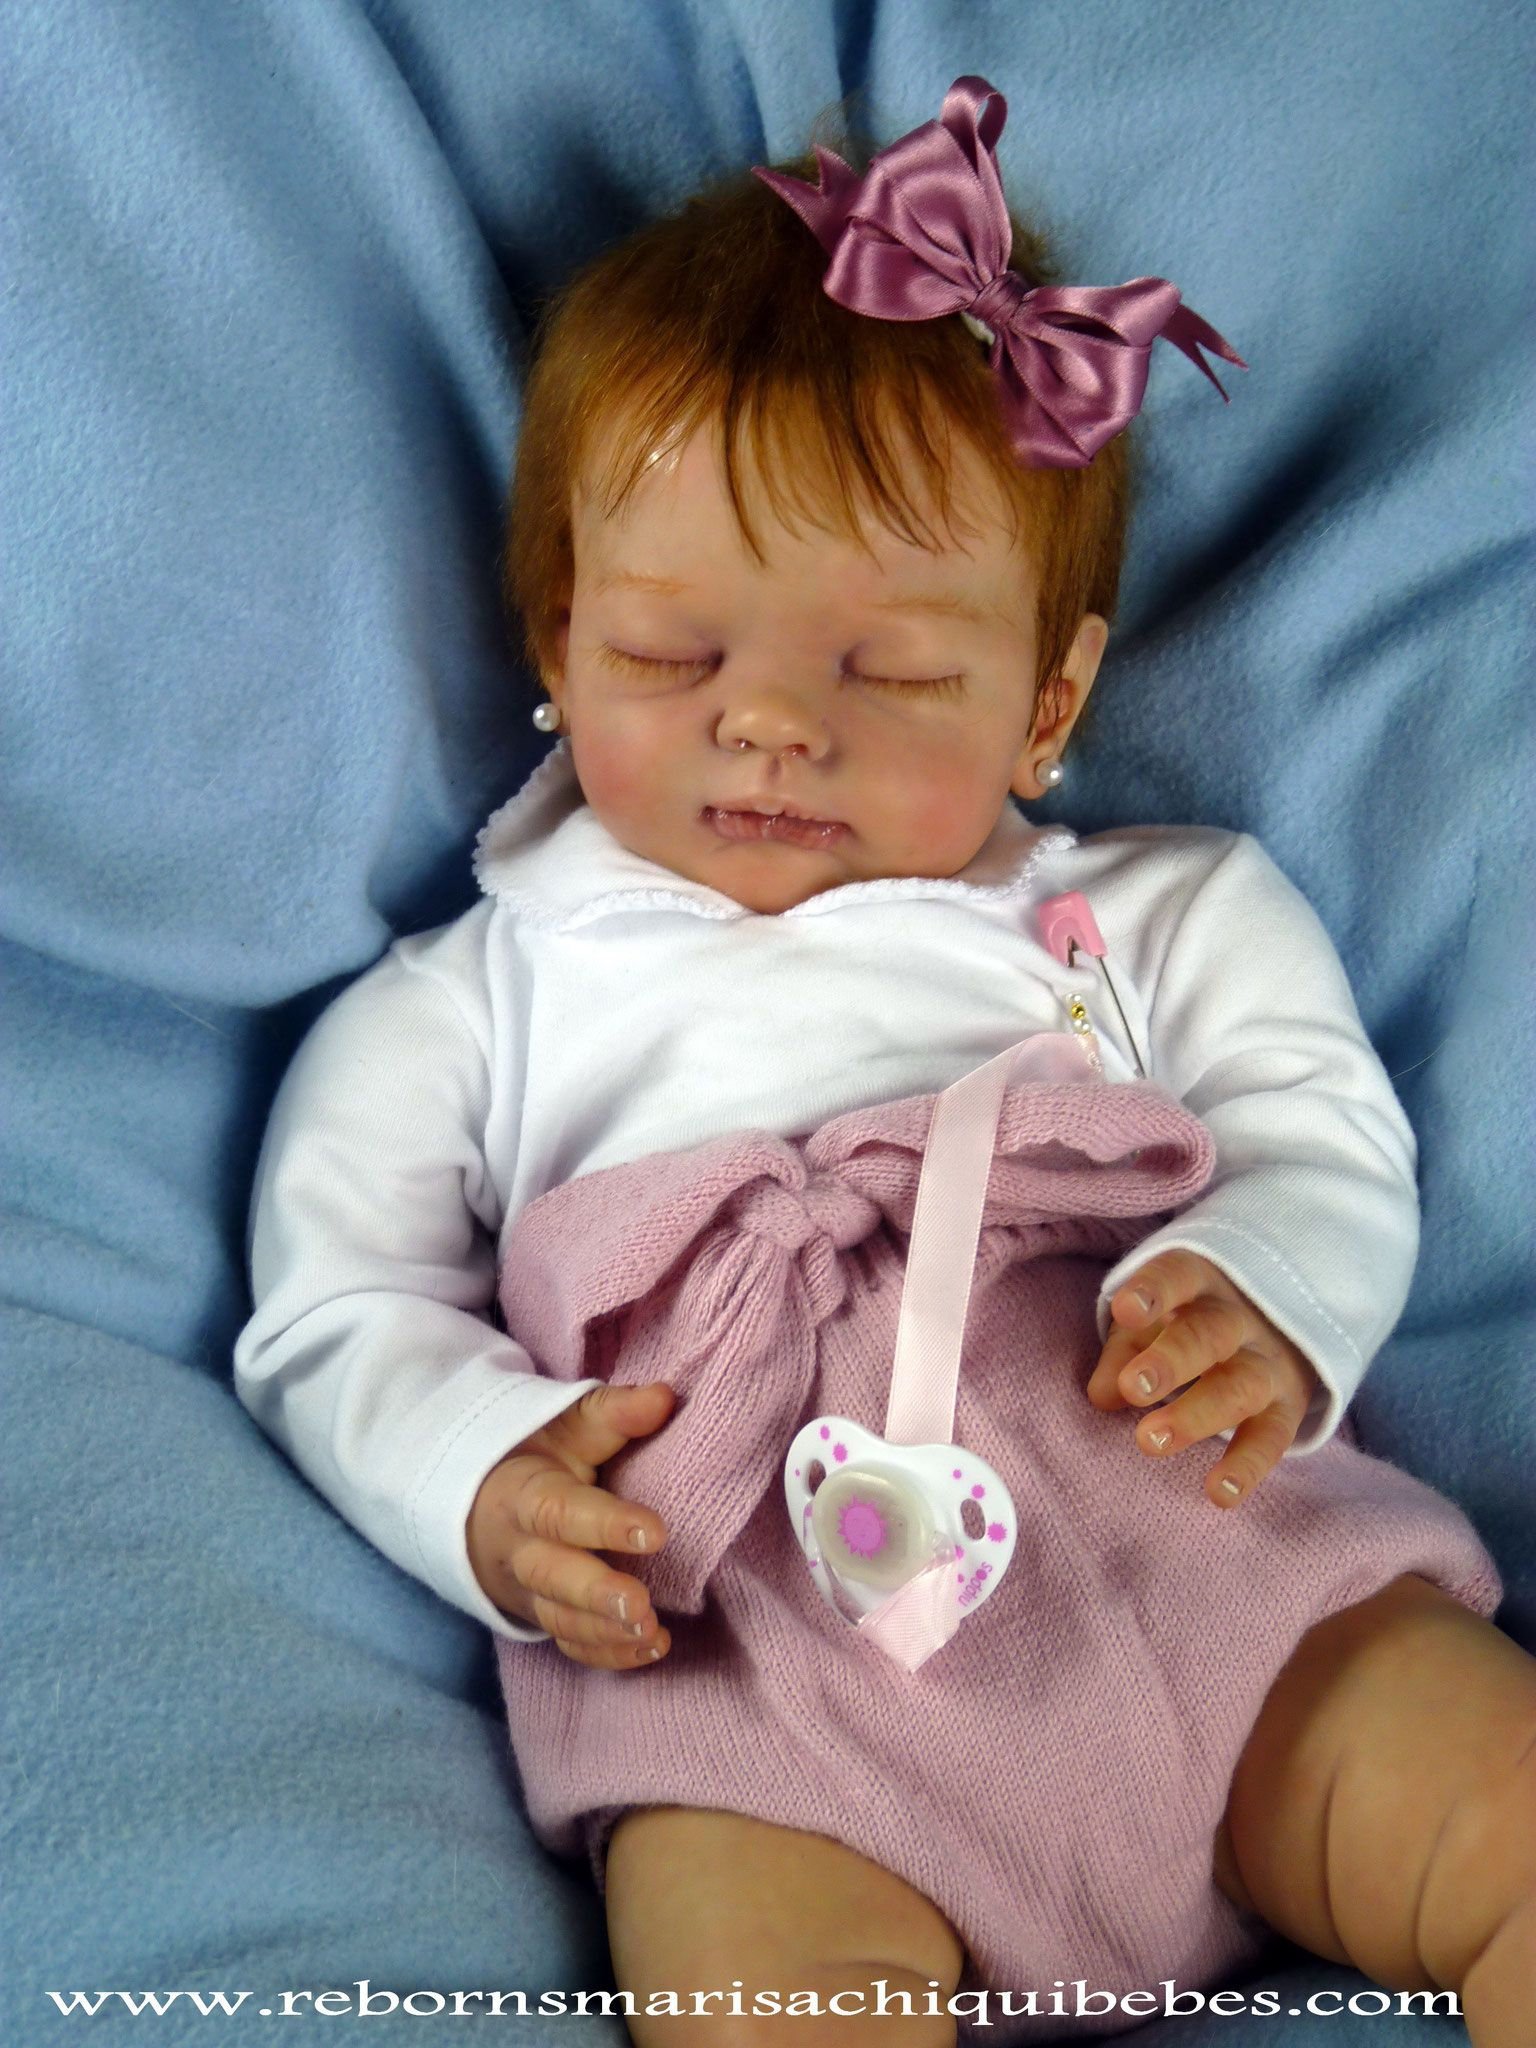 5b5e8f58b420 Muñecos Bebé Reborn - Bebes reborns de marisachiquibebes Reborn Baby Dolls,  Golden Retrievers, Bears